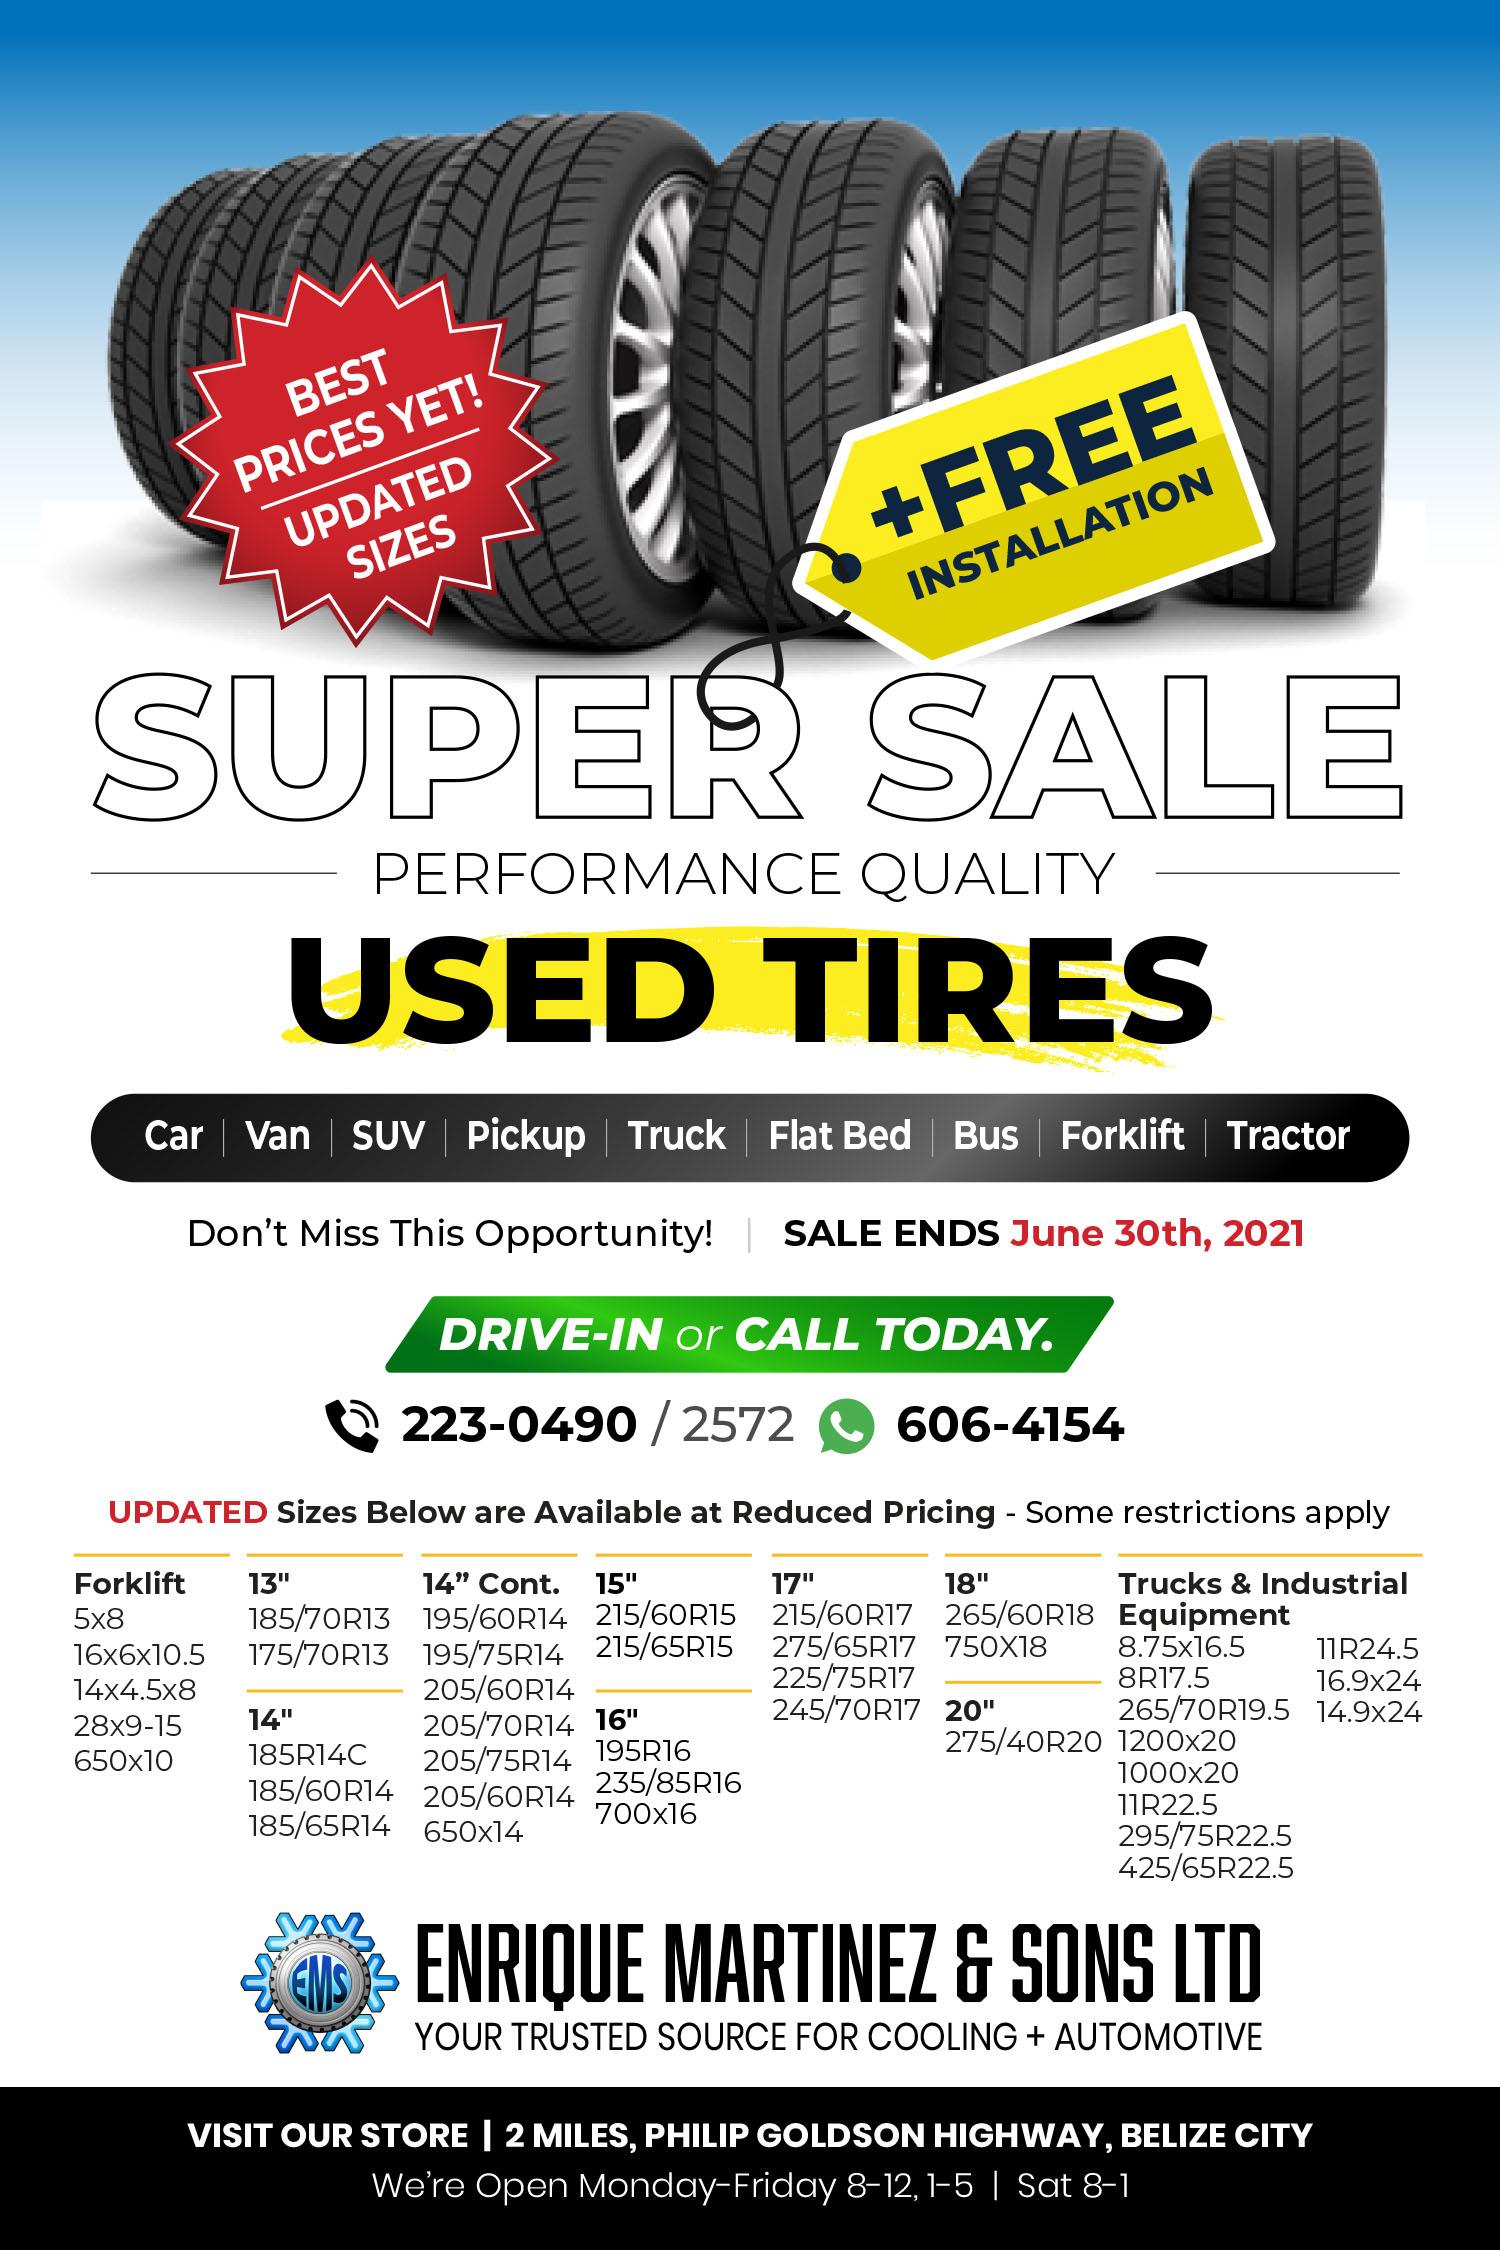 Advertisement for used tires distributed Enrique Martinez & Sons Ltd Belize